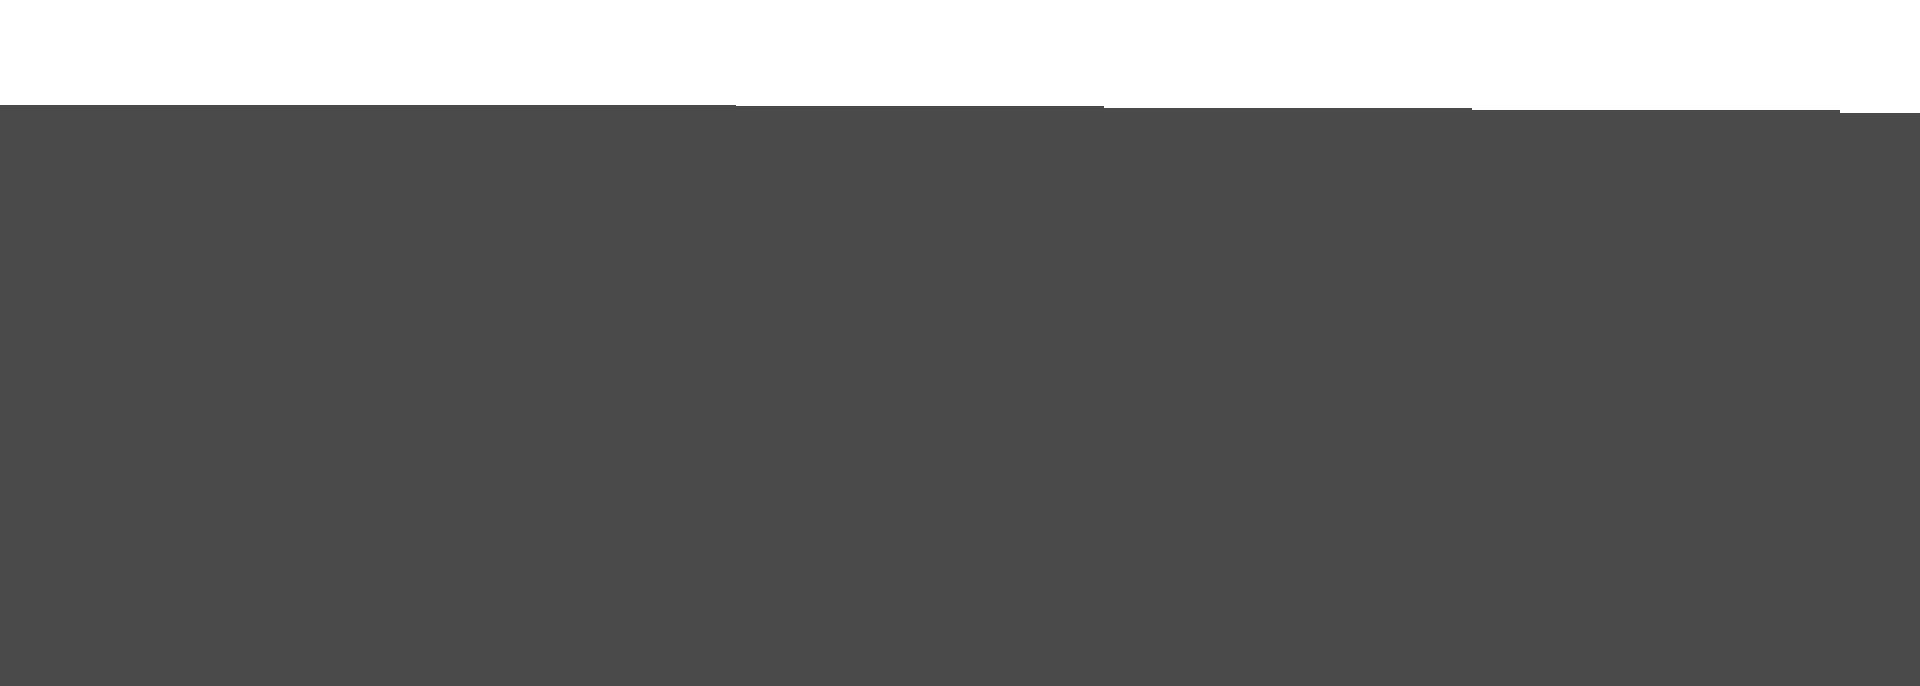 gradient-banner